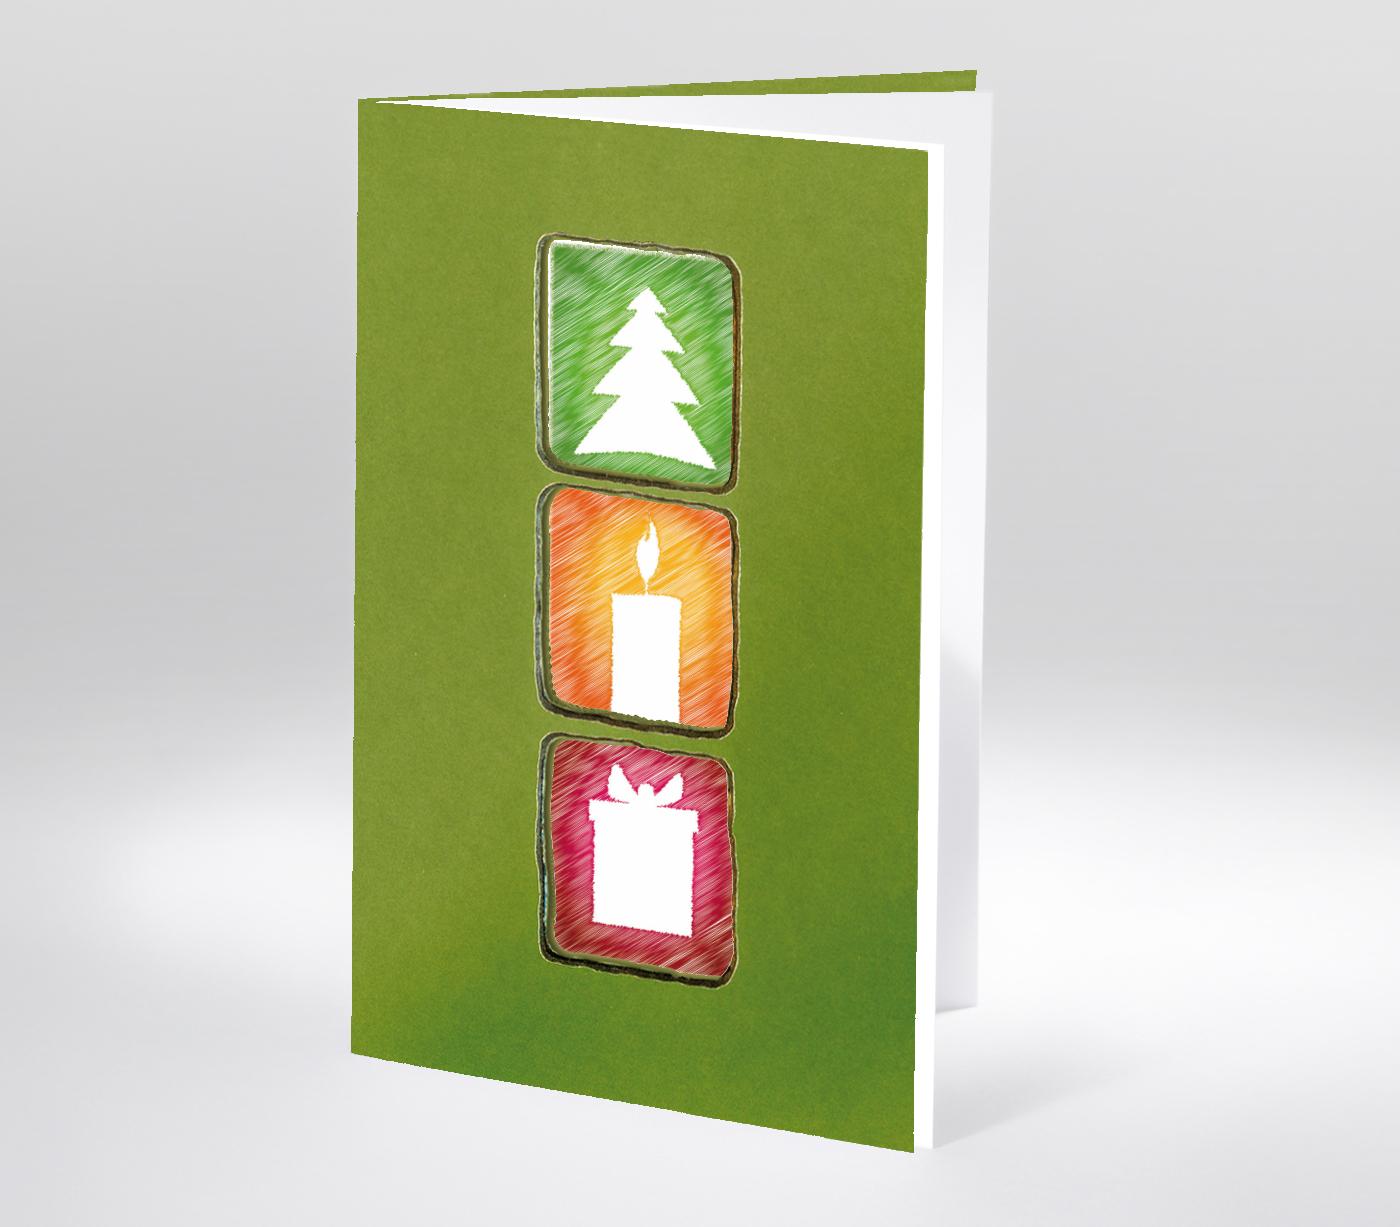 Moderne Weihnachtskarten.Moderne Weihnachtskarte